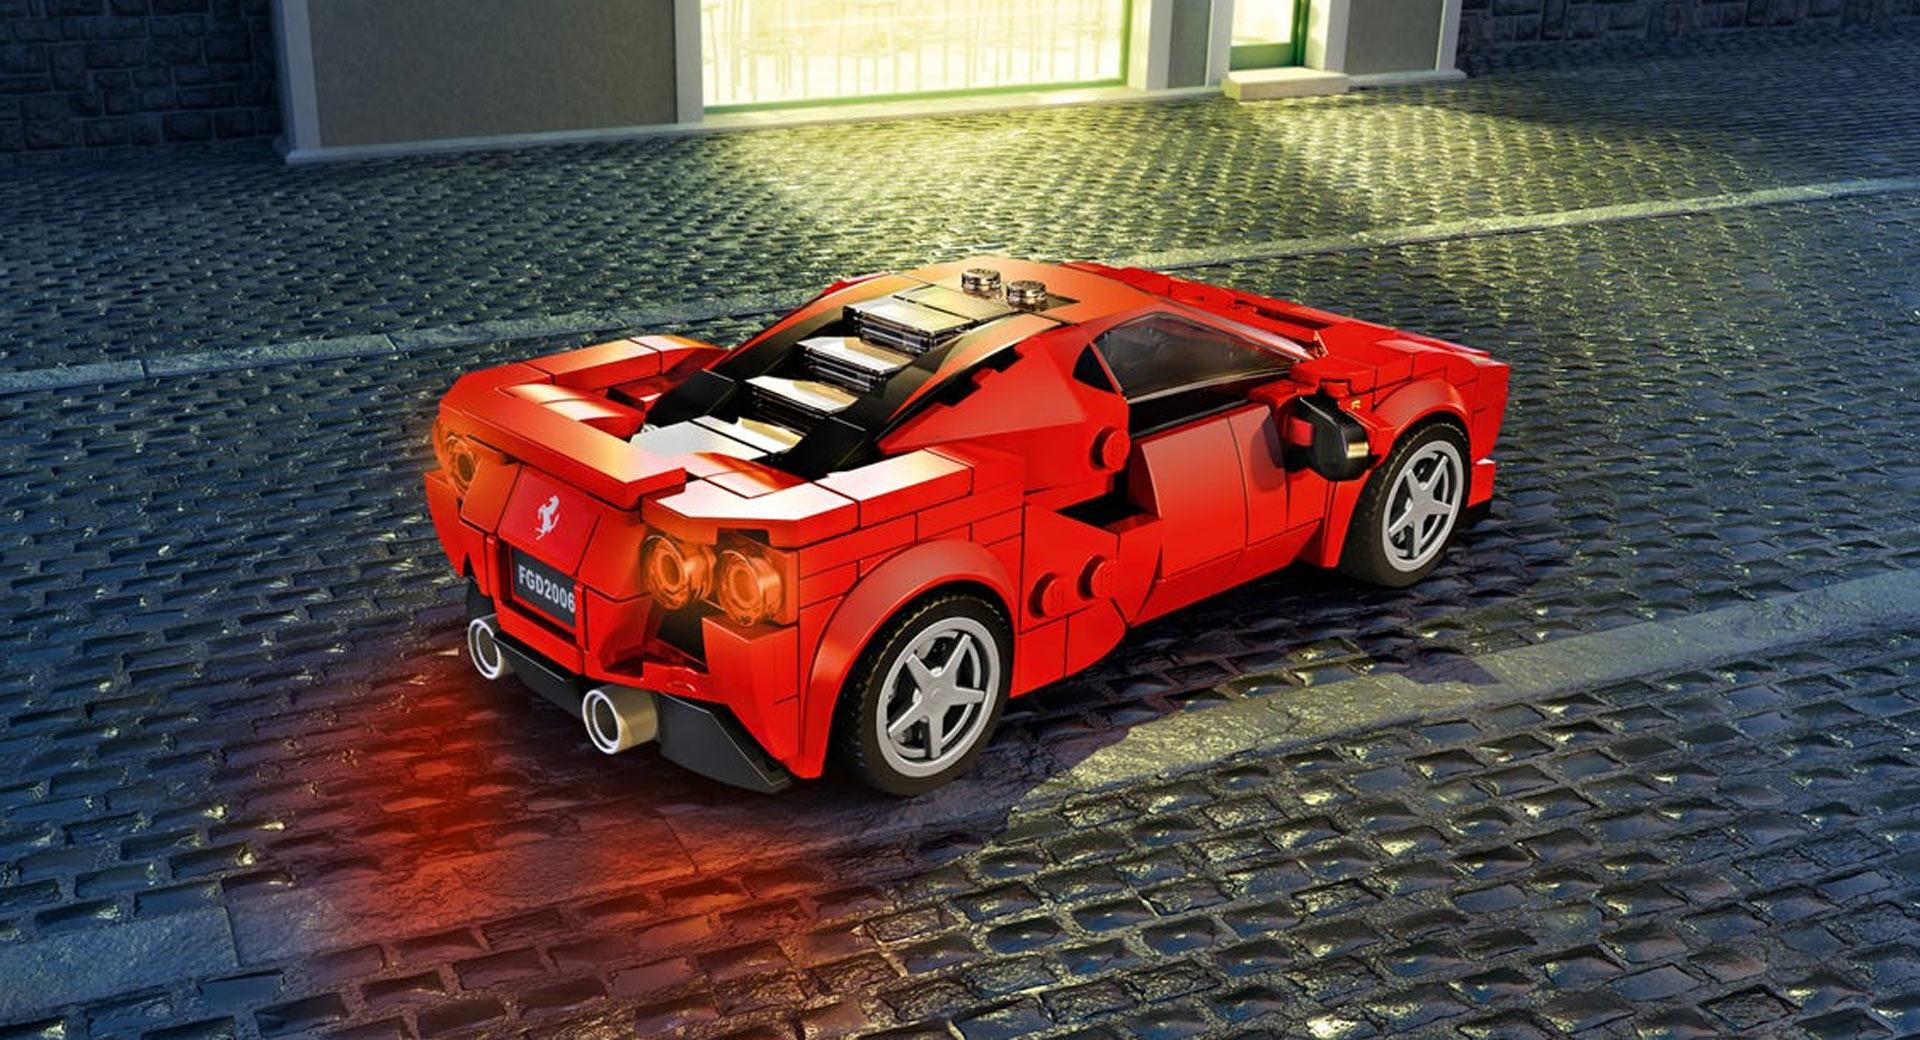 Ferrari-F8-Tributo-Lego-Speed-Champions-4